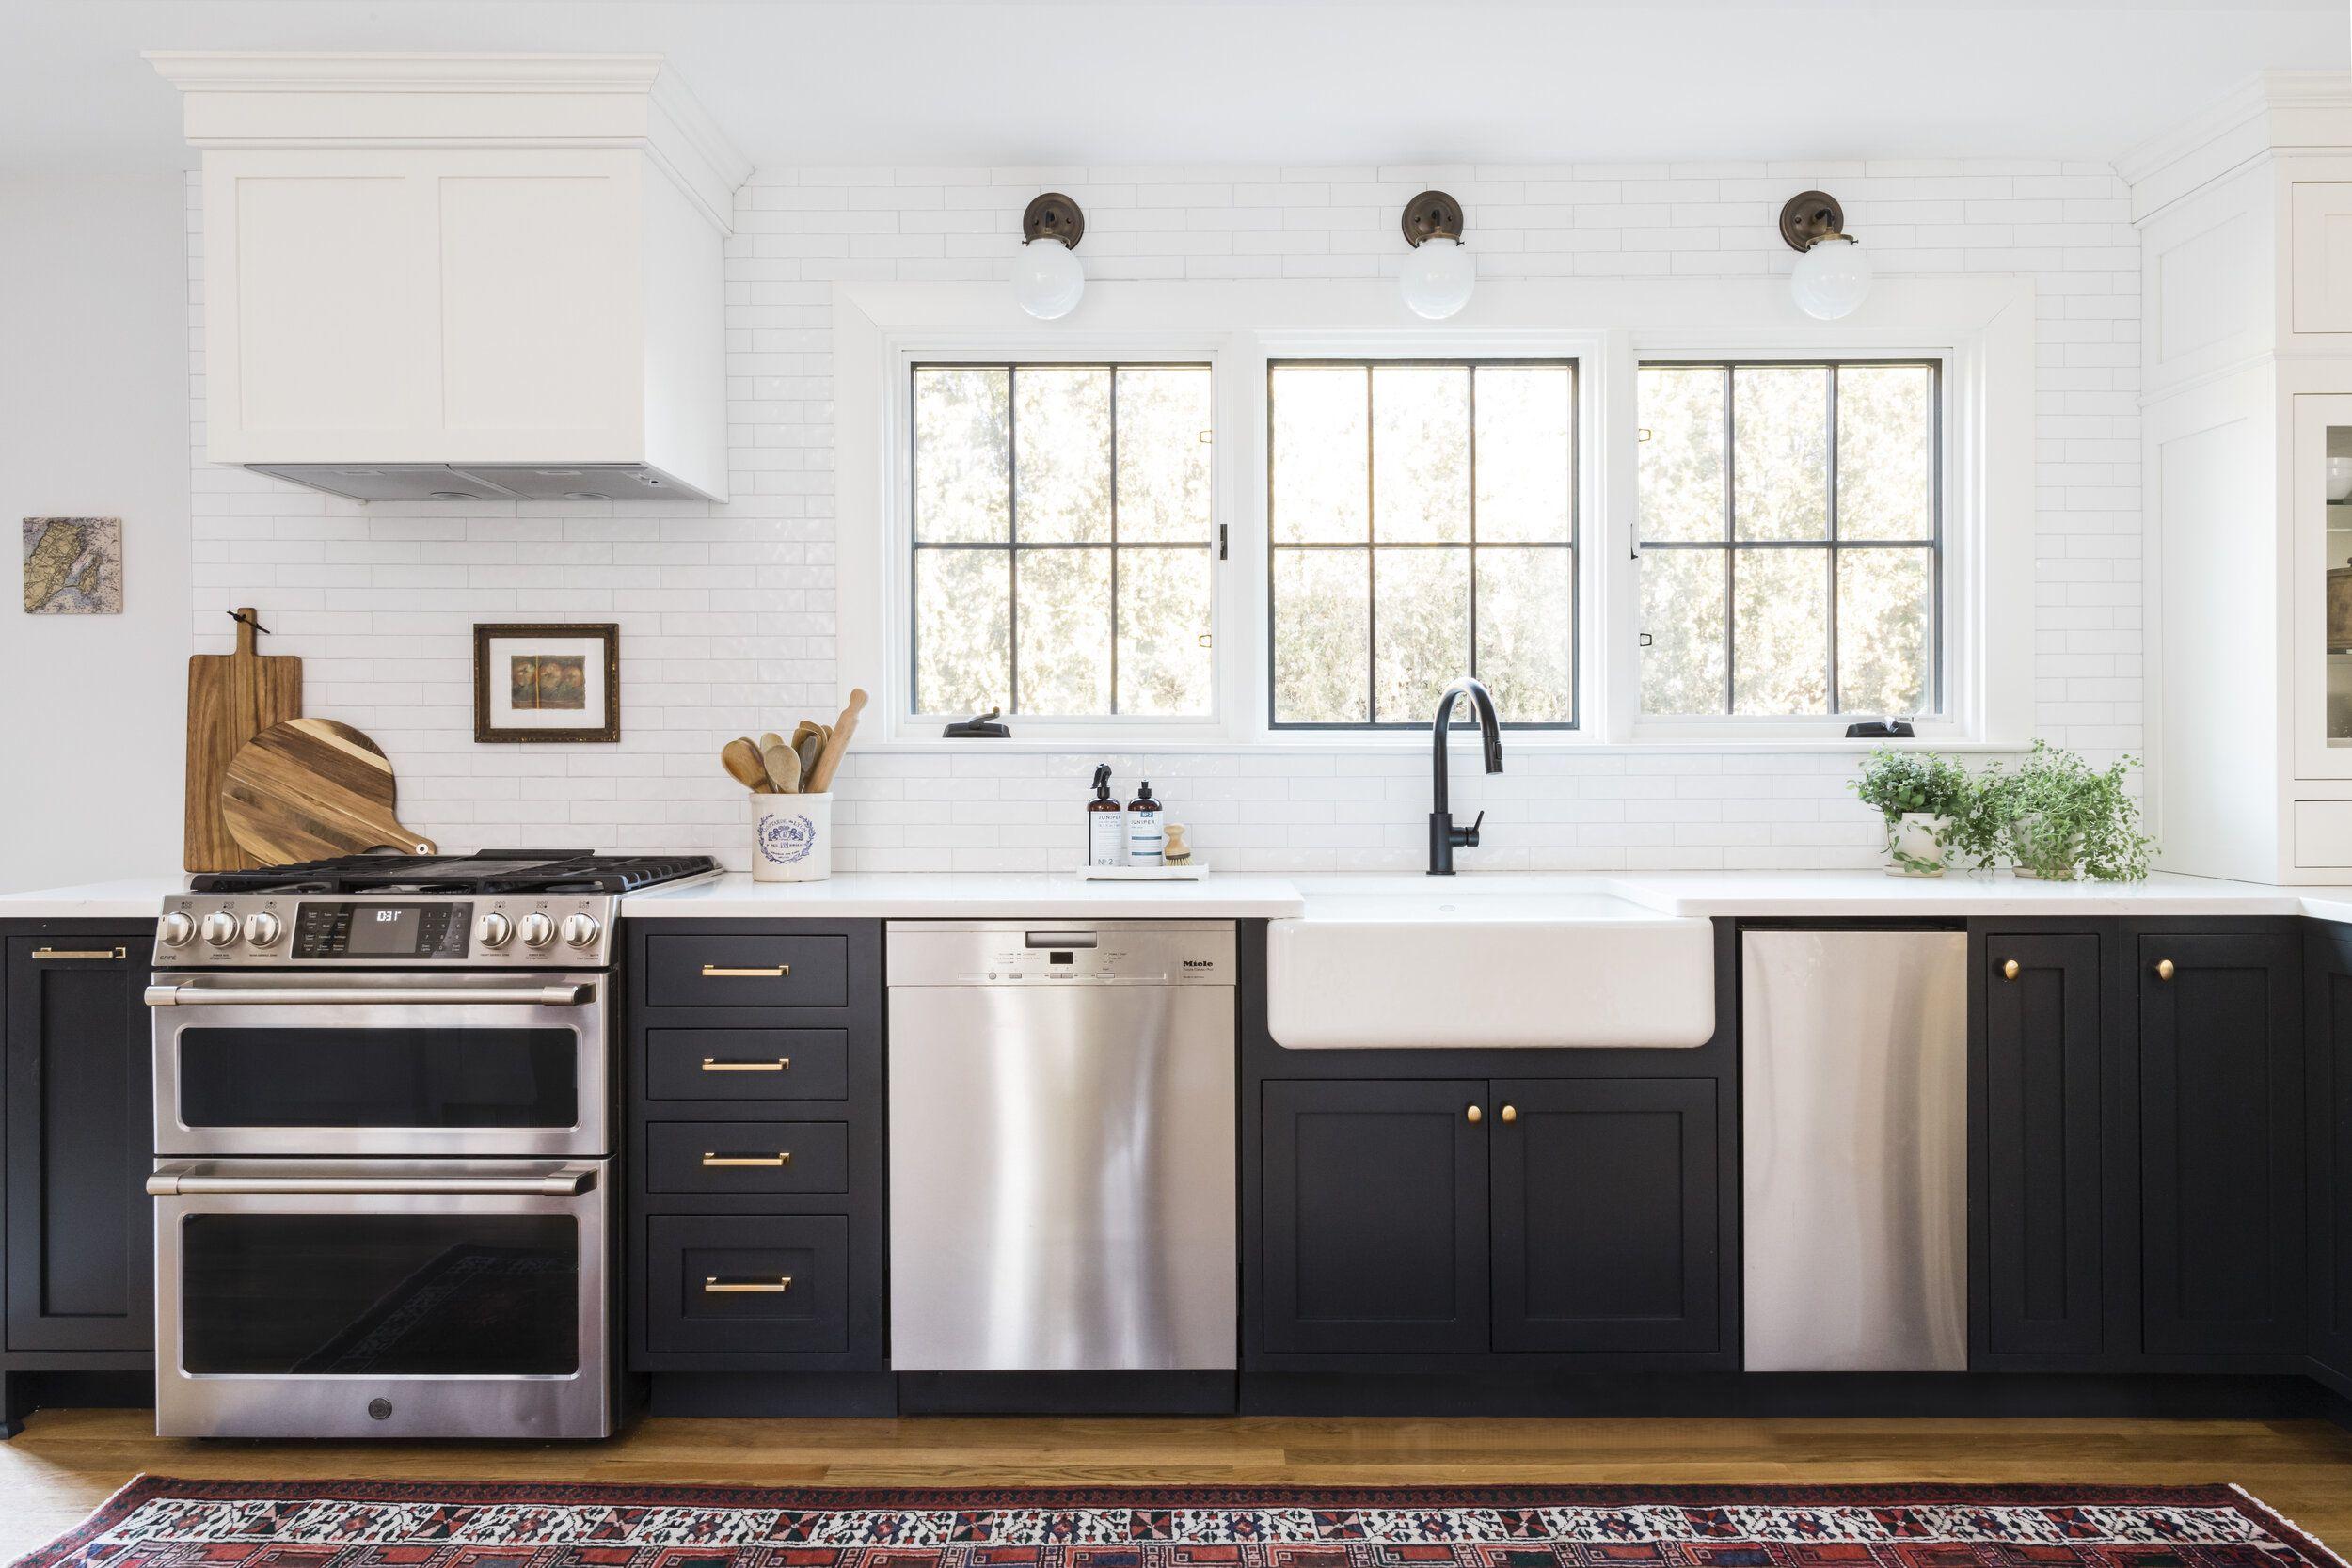 Tuxedo Kitchen Trim Design Co Black White Kitchen In 2020 Home Remodeling Kitchen Plans French Home Decor